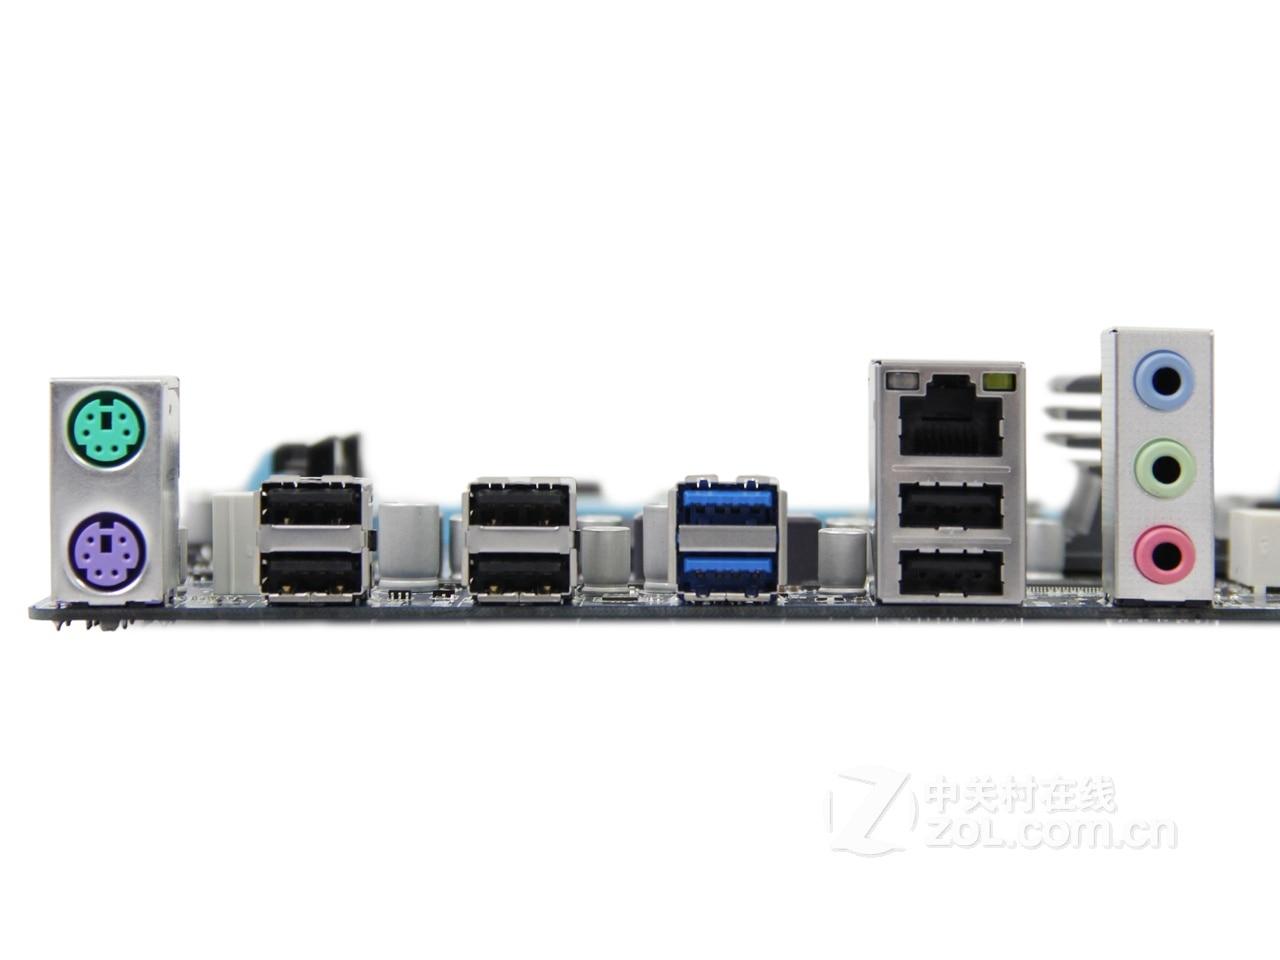 Интернет магазин товары для всей семьи HTB1USq.XITxK1Rjy0Fgq6yovpXaD Разъем AM3 + для AMD 970 гигабайт GA-970A-DS3 100% Оригинал материнская плата DDR3 DIMM USB3.0 32G гигабайт 970A-DS3 Desktop SATA III